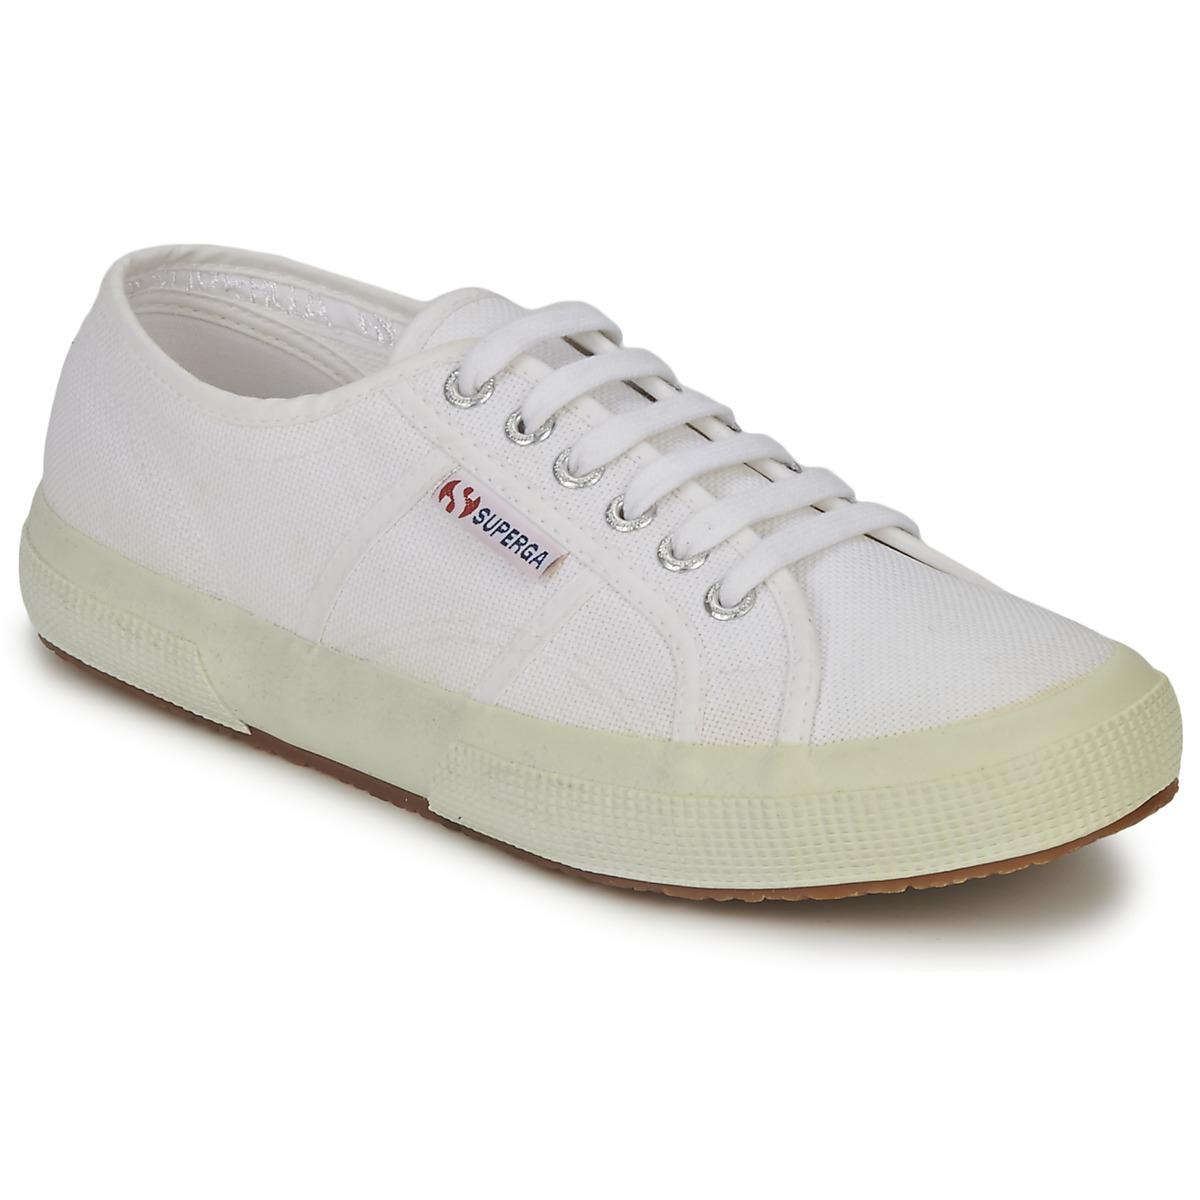 2750 Cotu Classic Sneakers in White